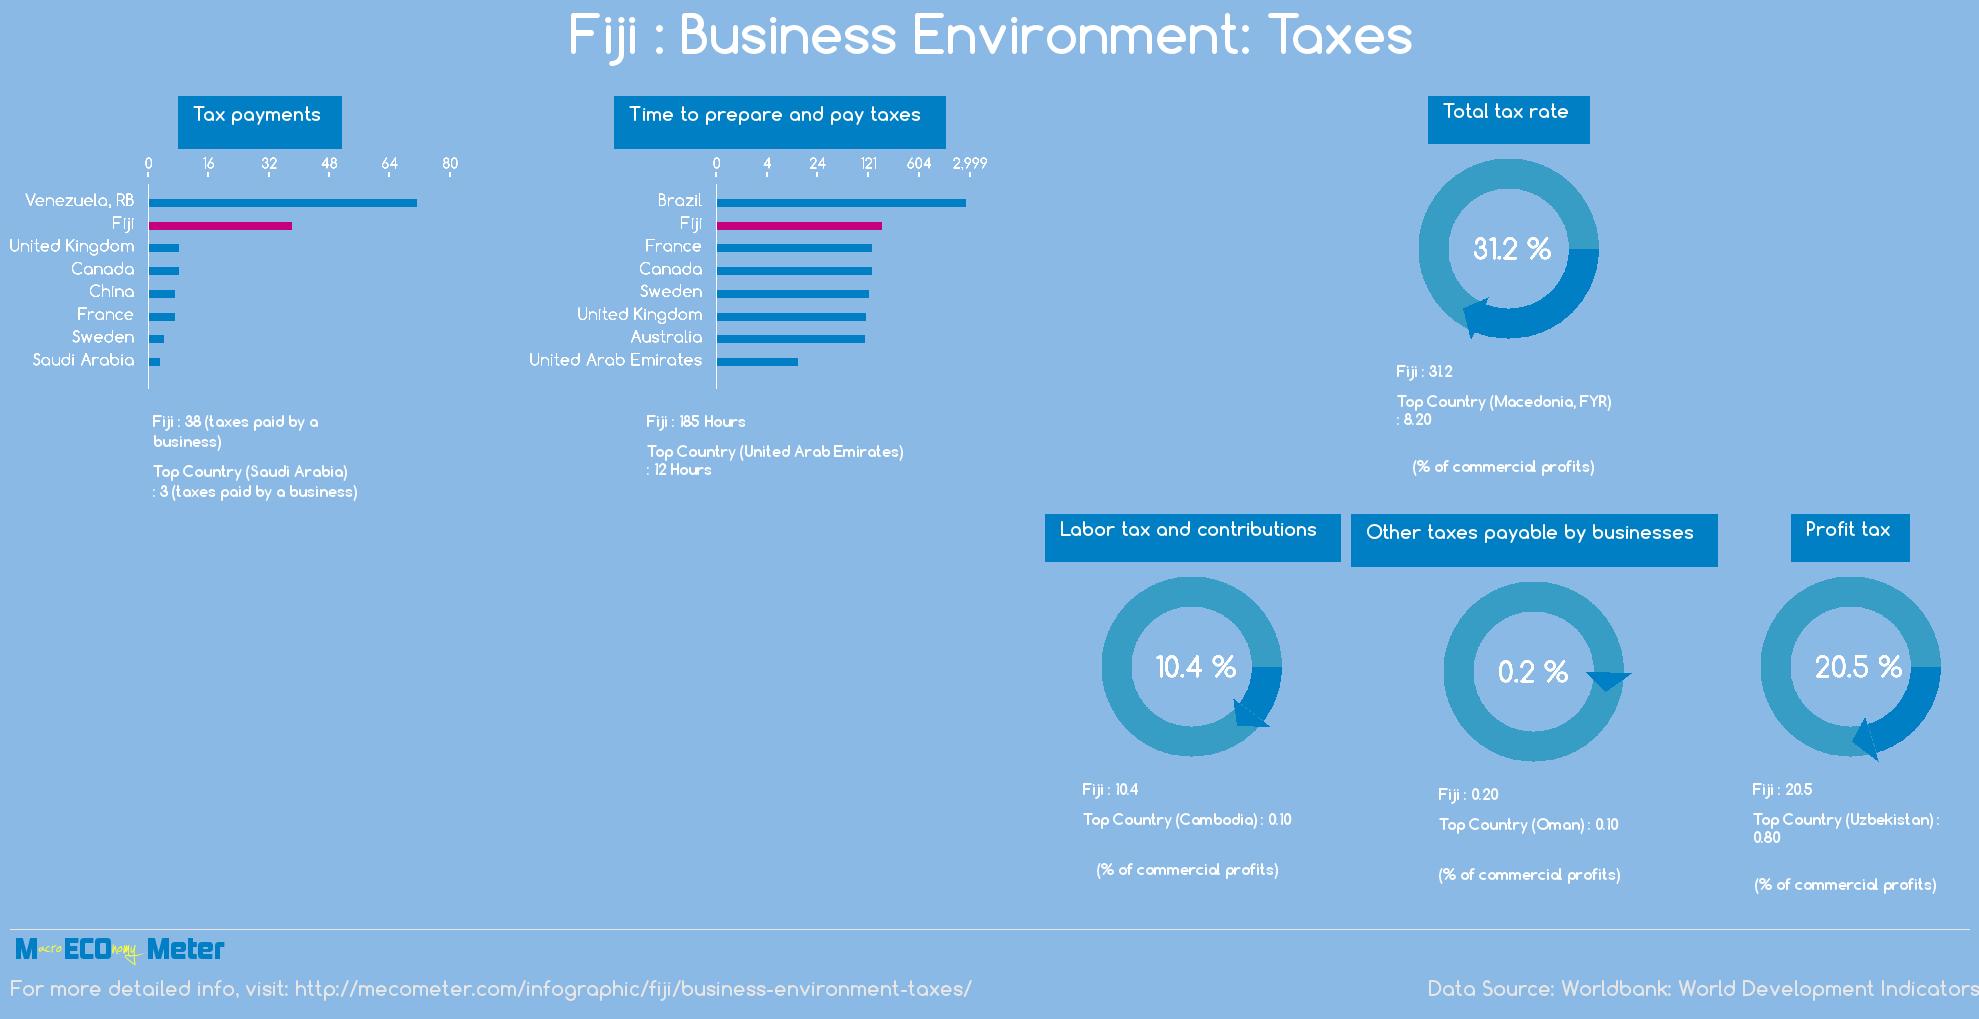 Fiji : Business Environment: Taxes